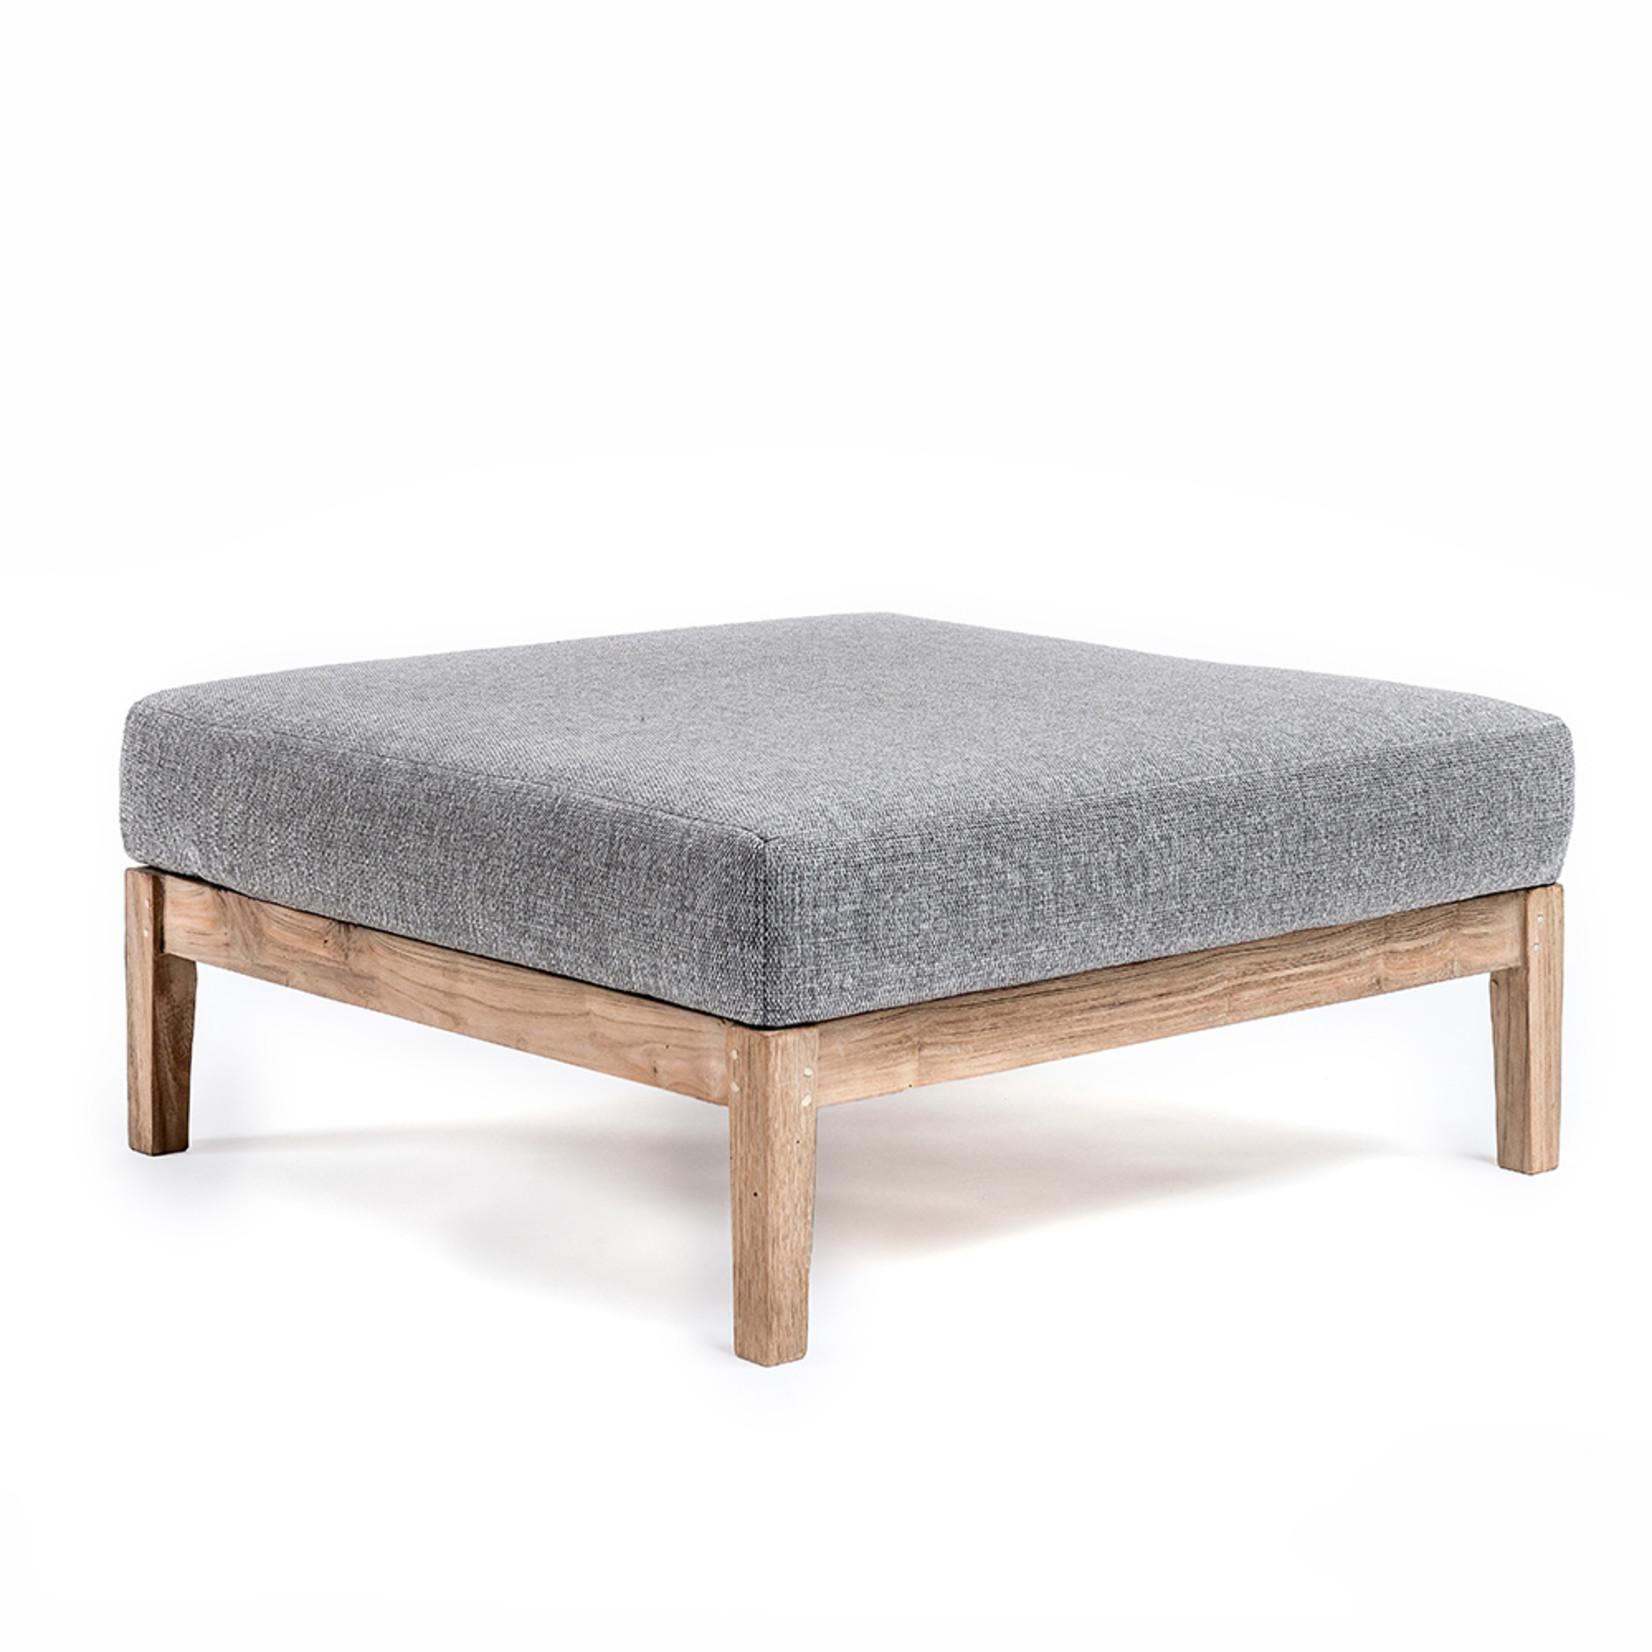 Gommaire Ottoman Copenhague | Reclaimed Teak Natural Grey + Cushion